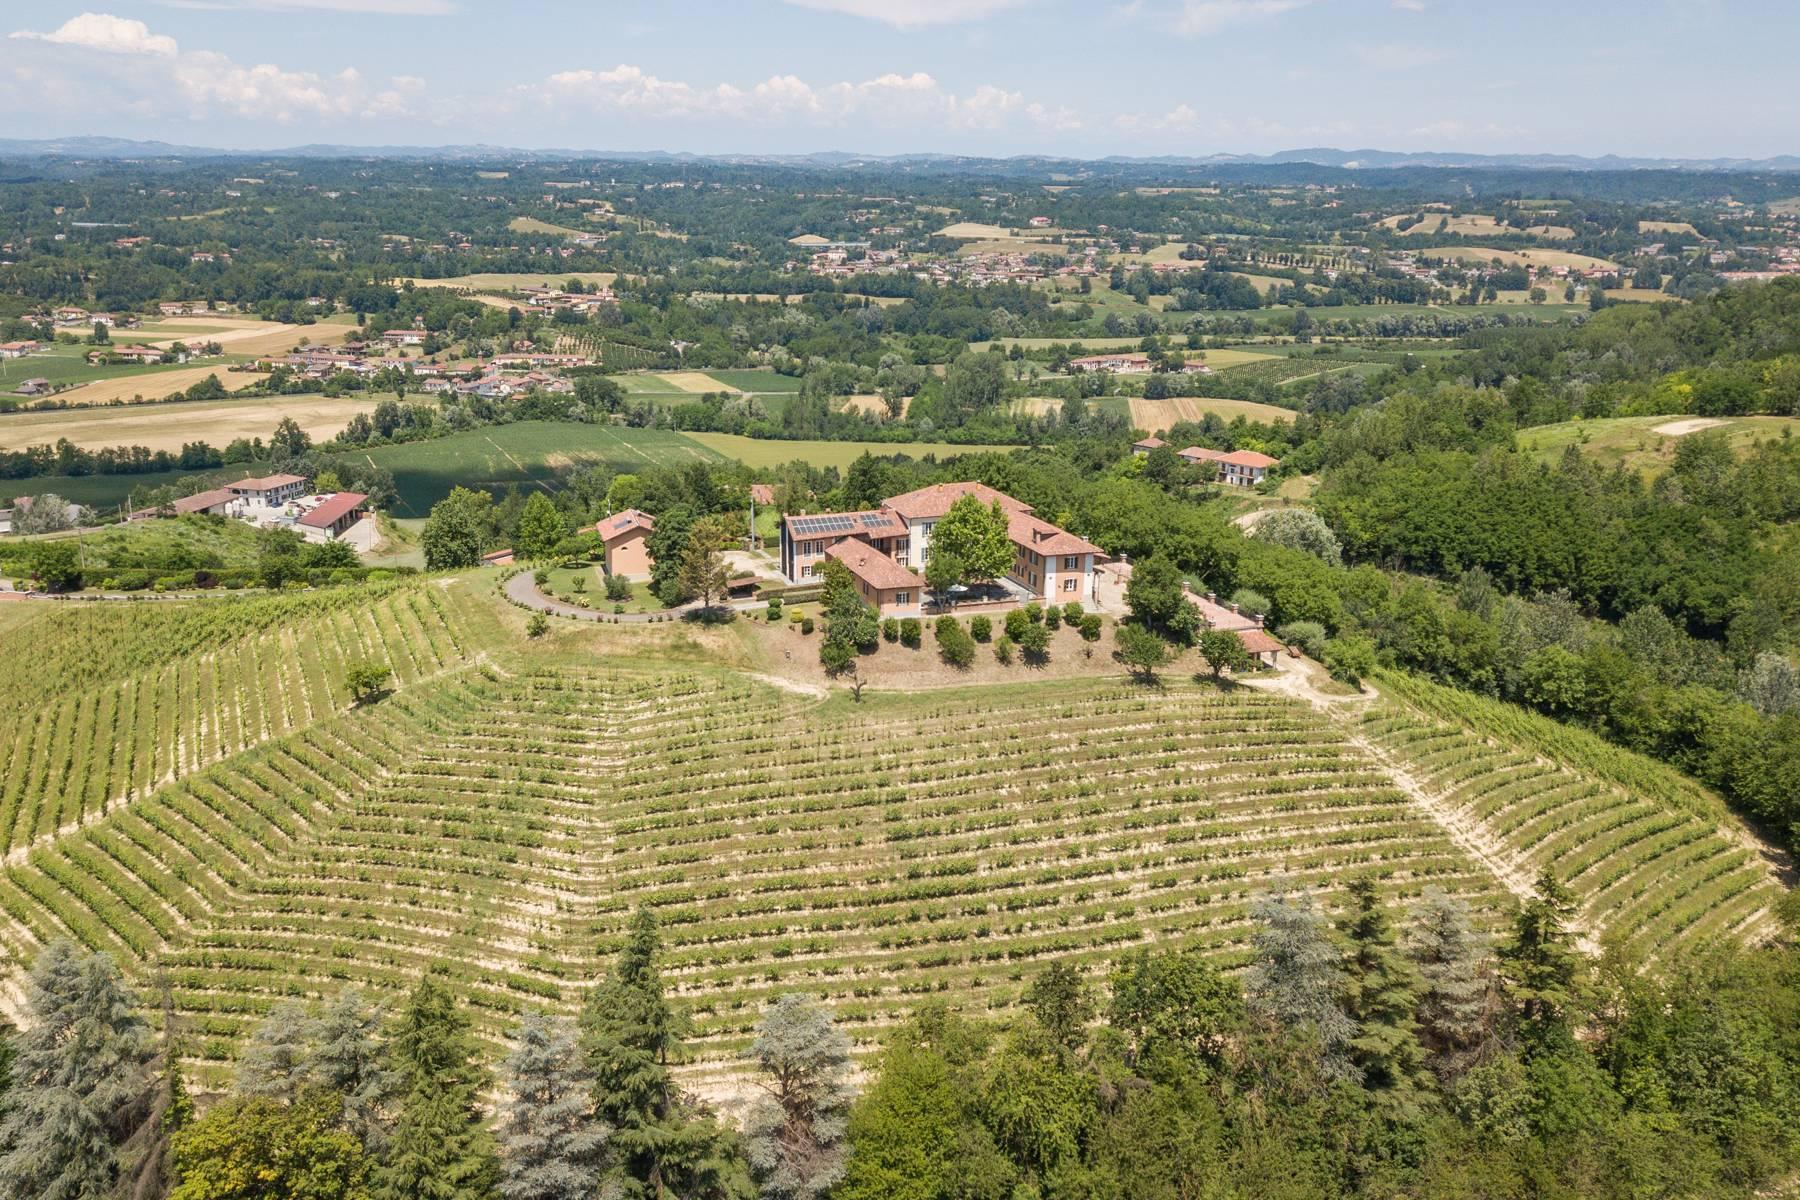 Prestigious estate with breathtaking views of the Alps - 35